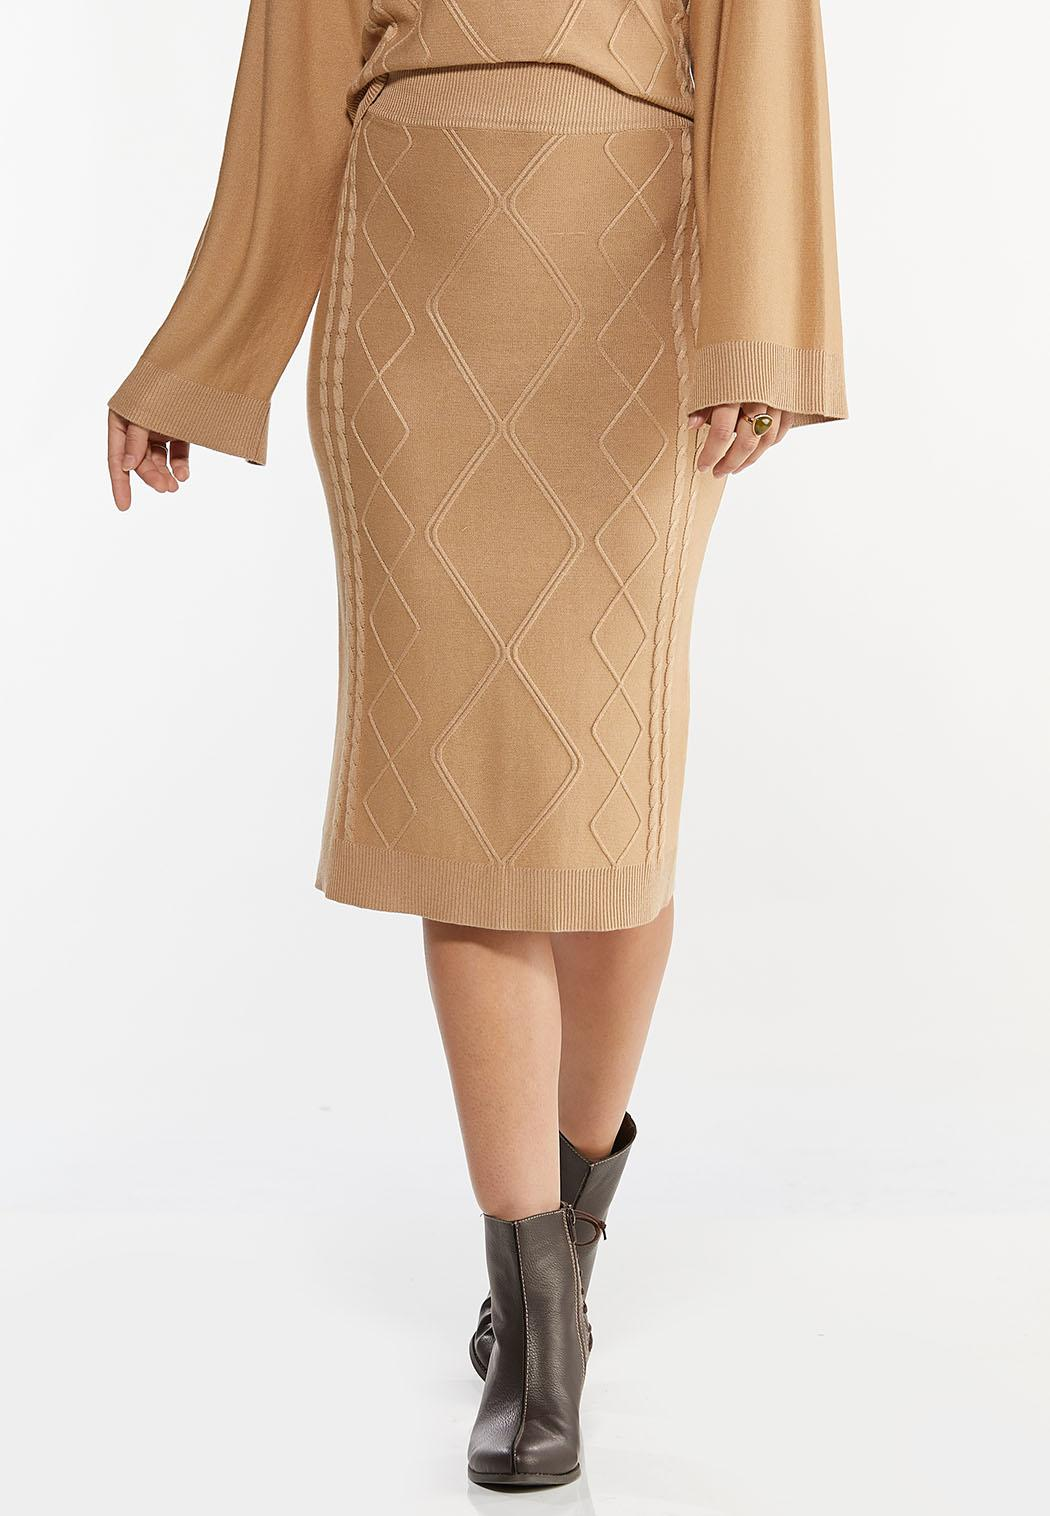 Caramel Cable Knit Skirt (Item #44403101)